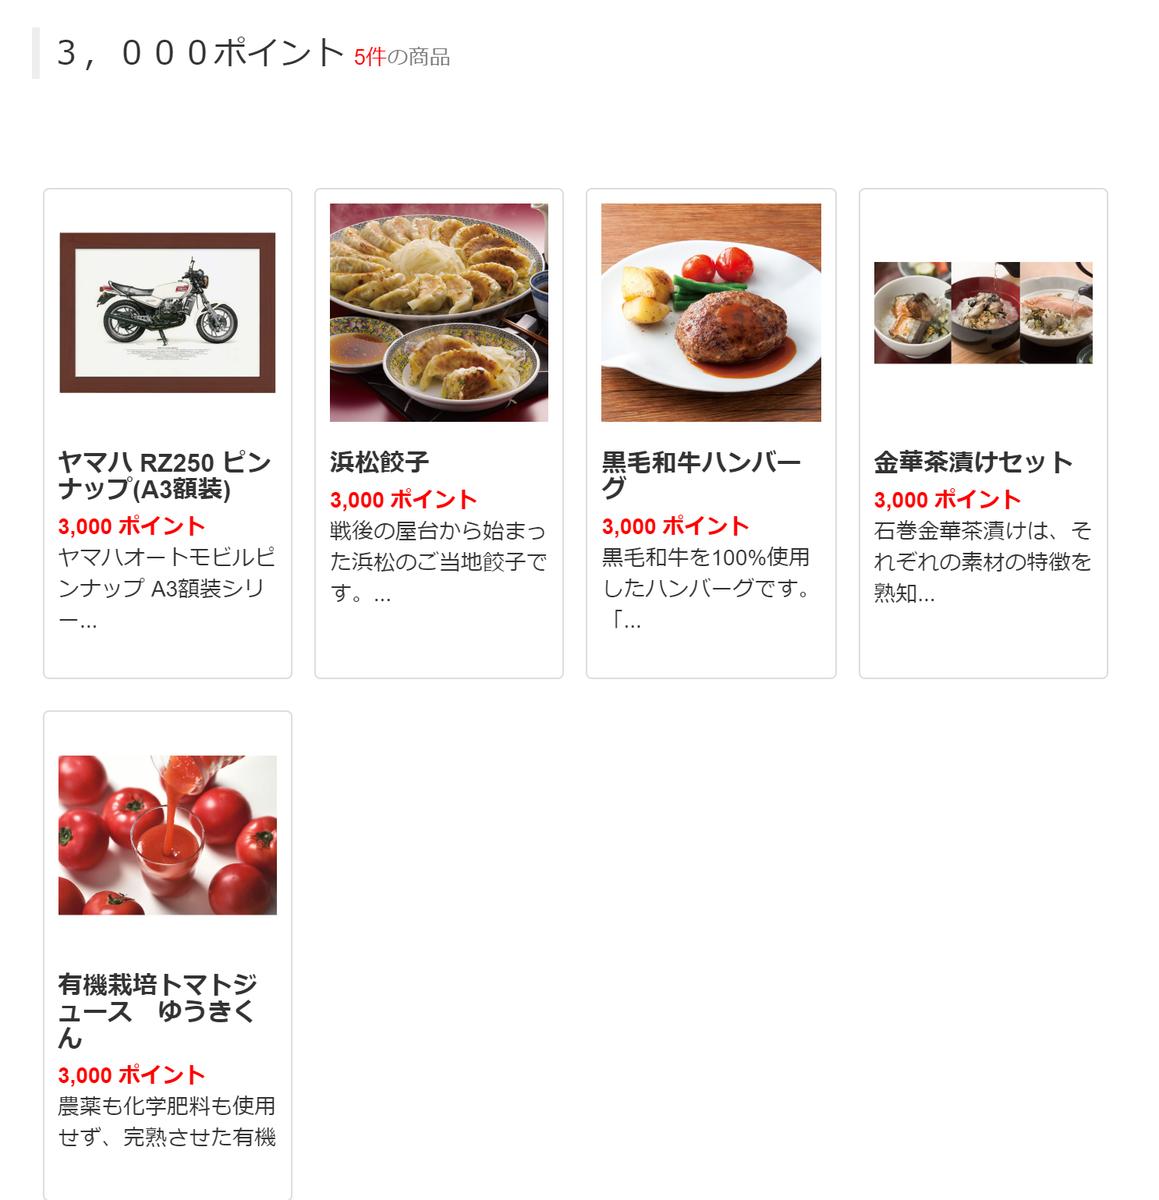 f:id:ushirotaro:20200306173507p:plain